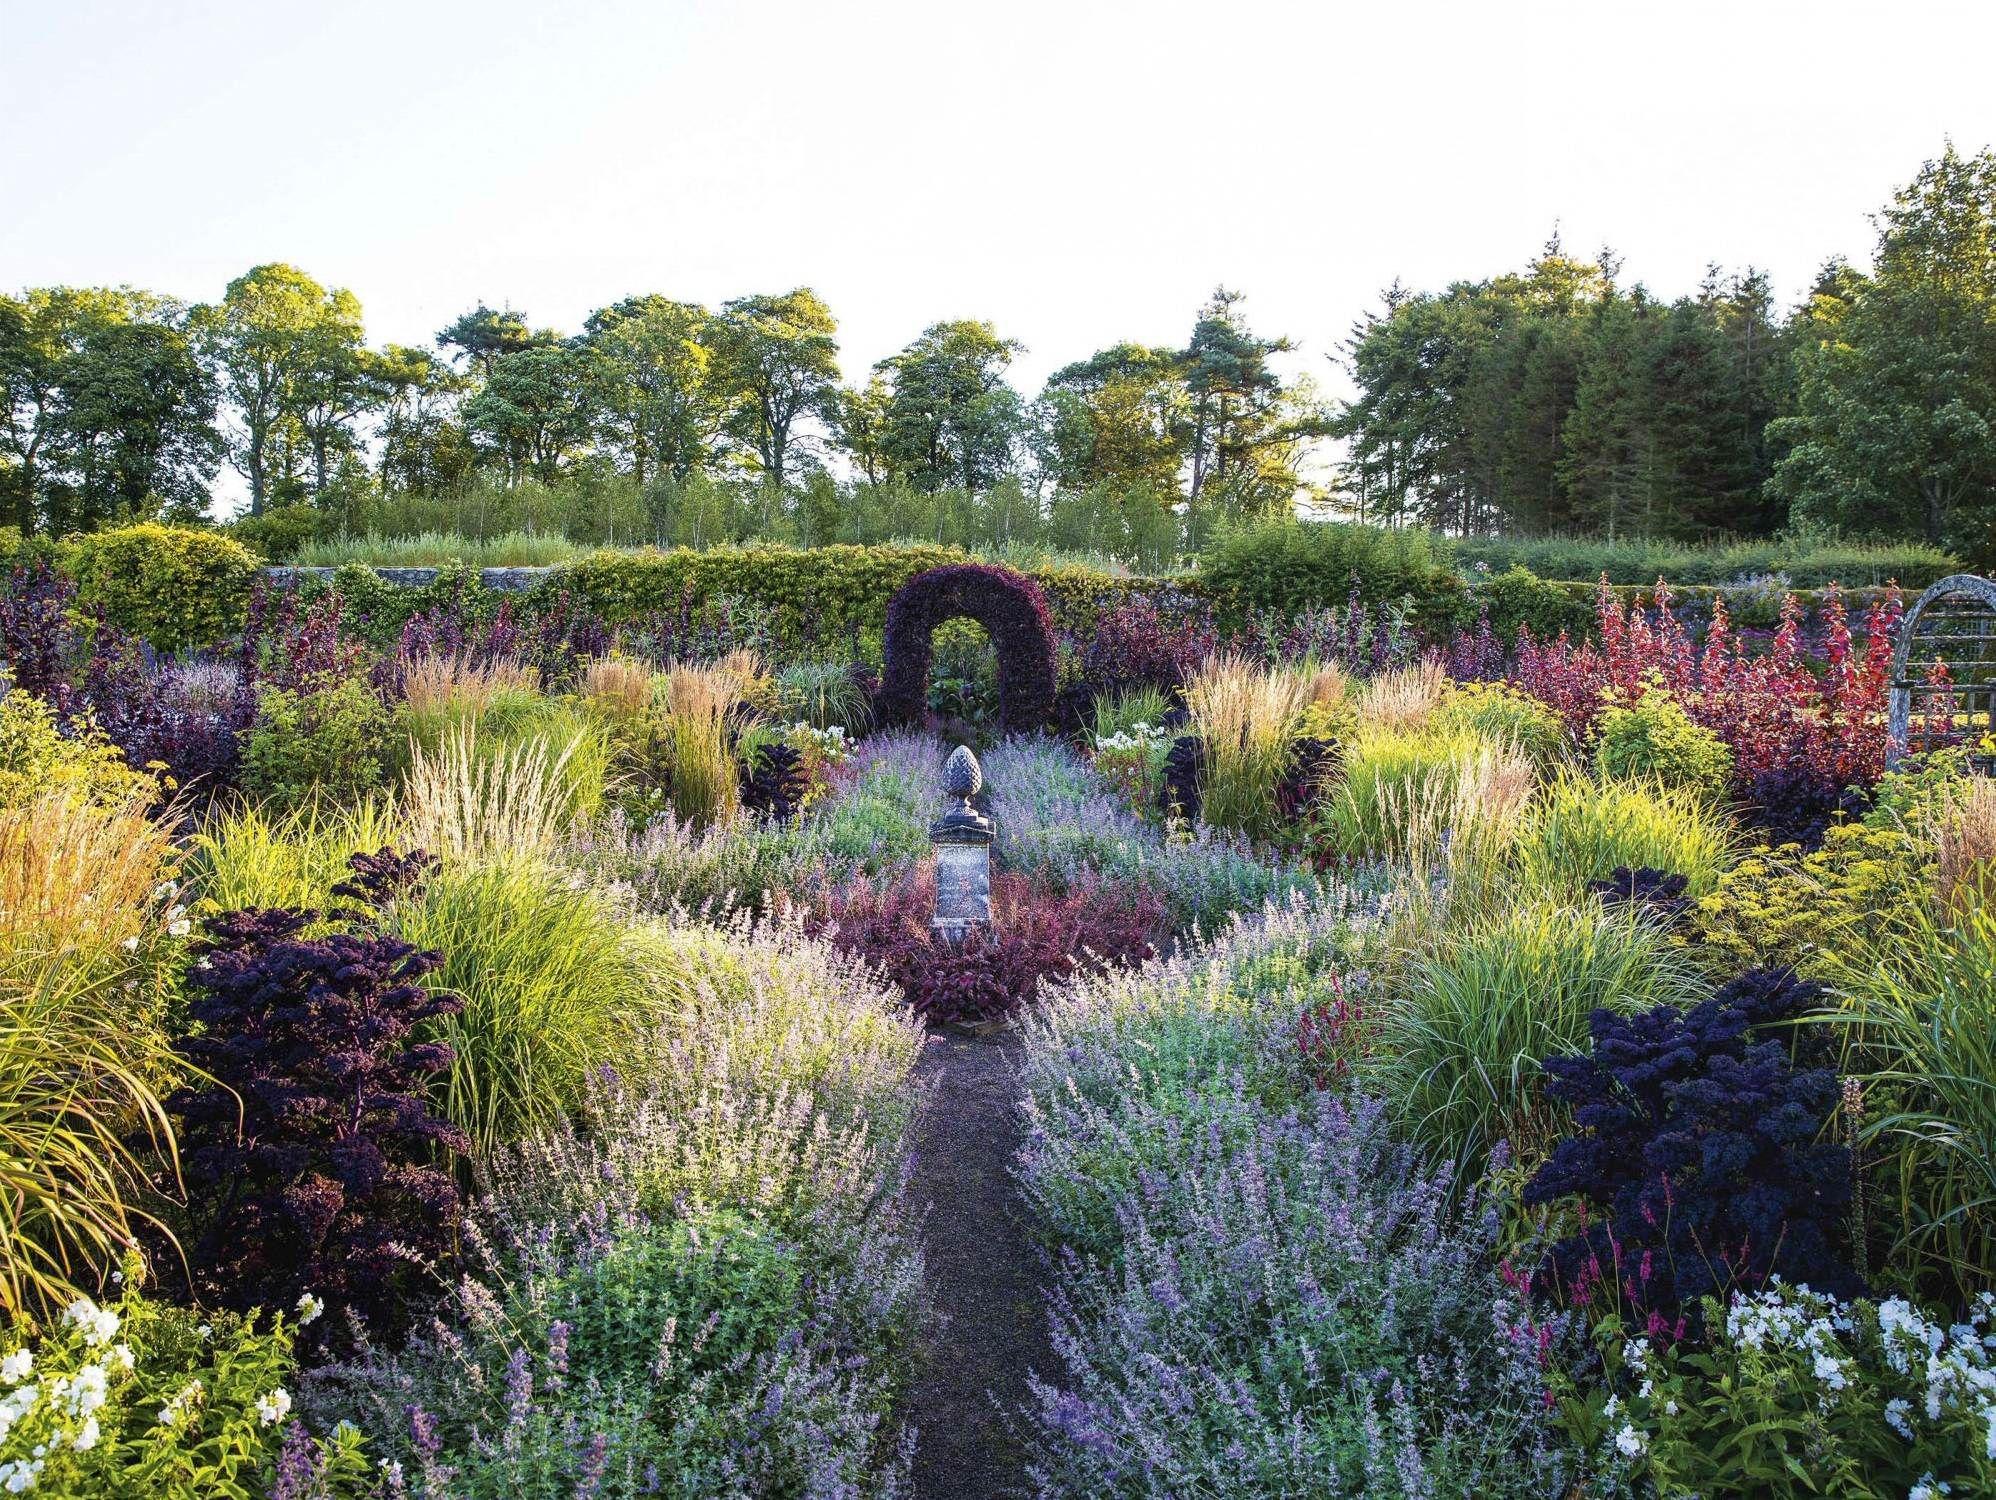 Whitburgh House Garden Midlothian United Kingdom C Claire Takacs Classic Garden House Landscape Garden